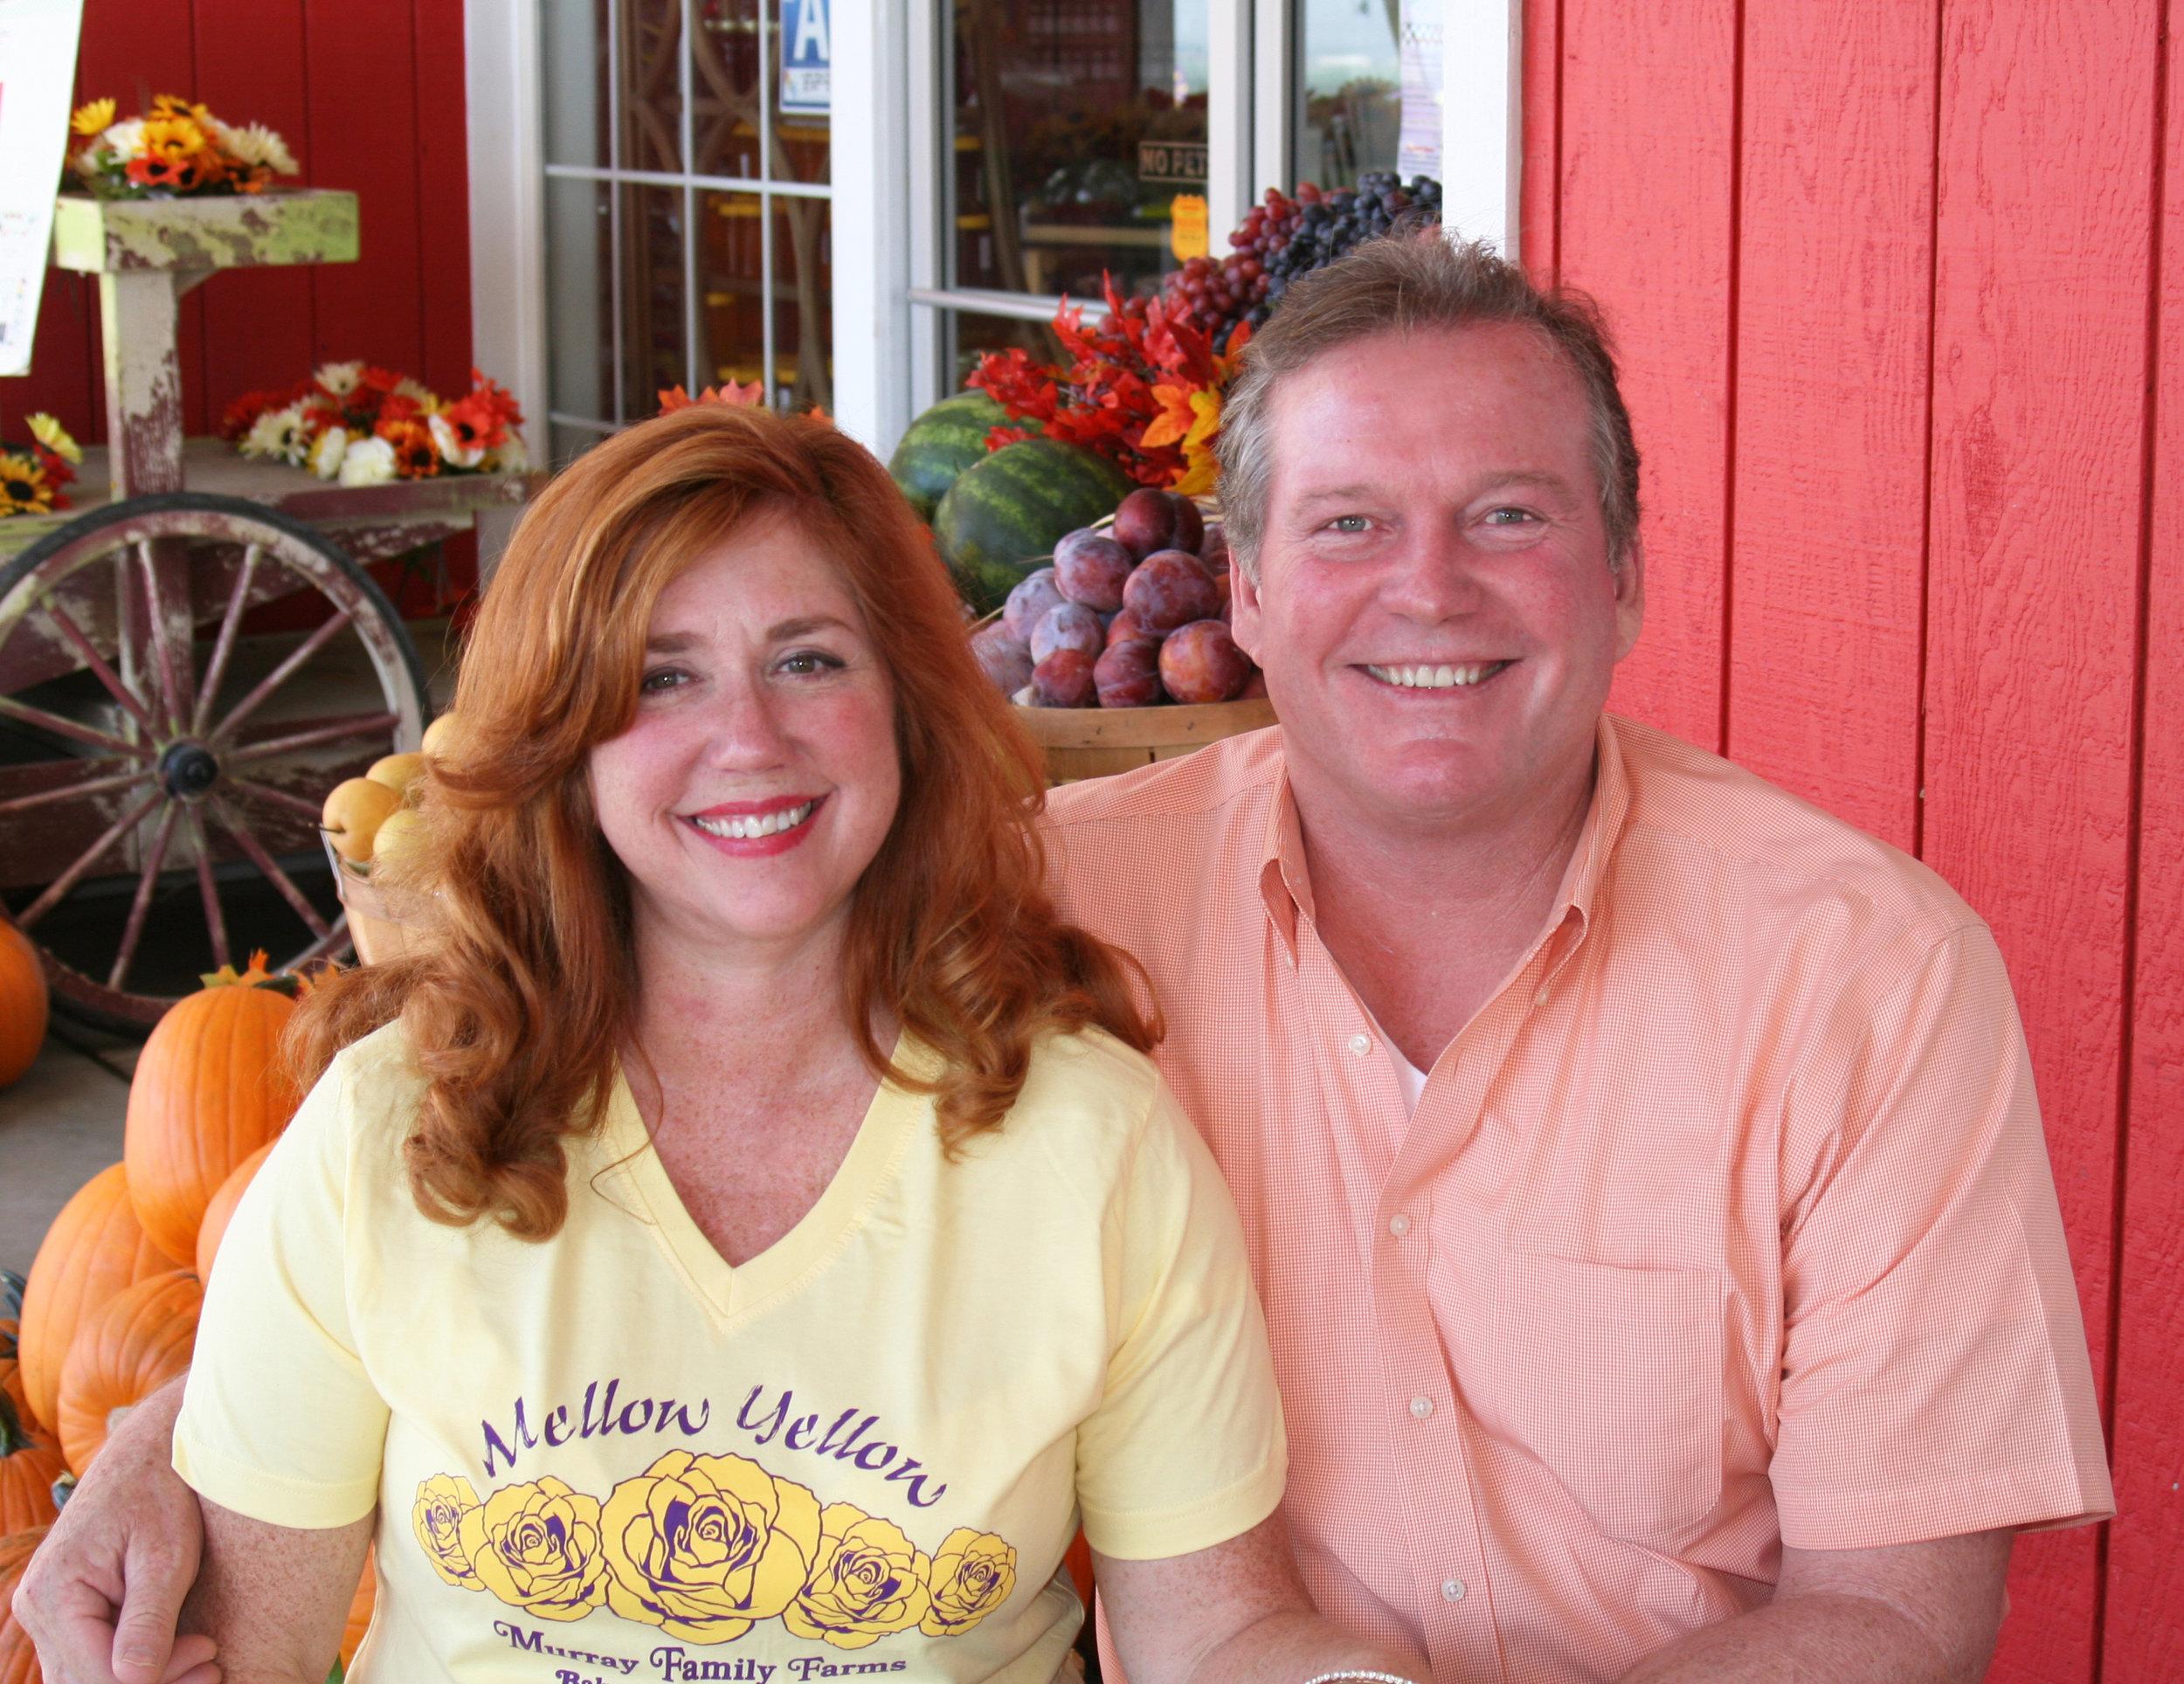 Steve-and-Vickie-Murray-TL1.jpg